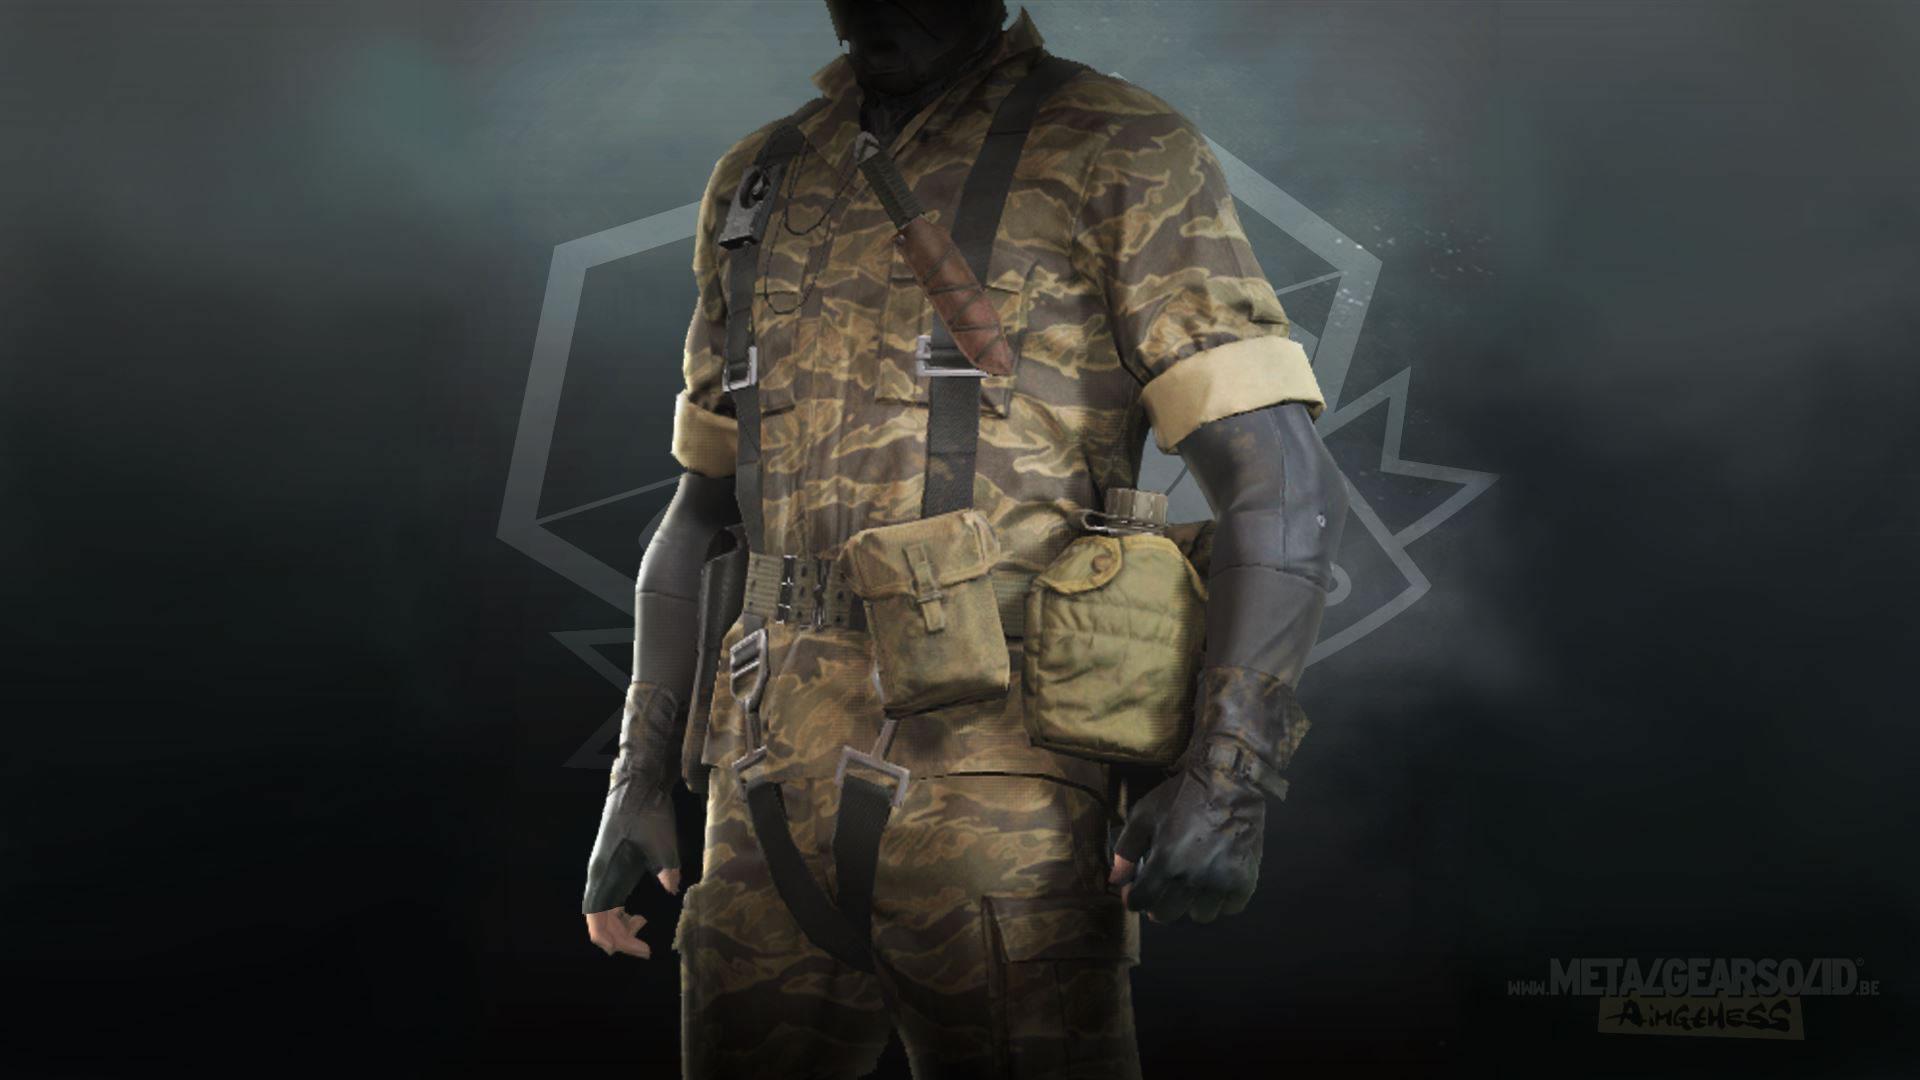 mgsv-tpp-costumes-dlc-treillis-naked-snake-01